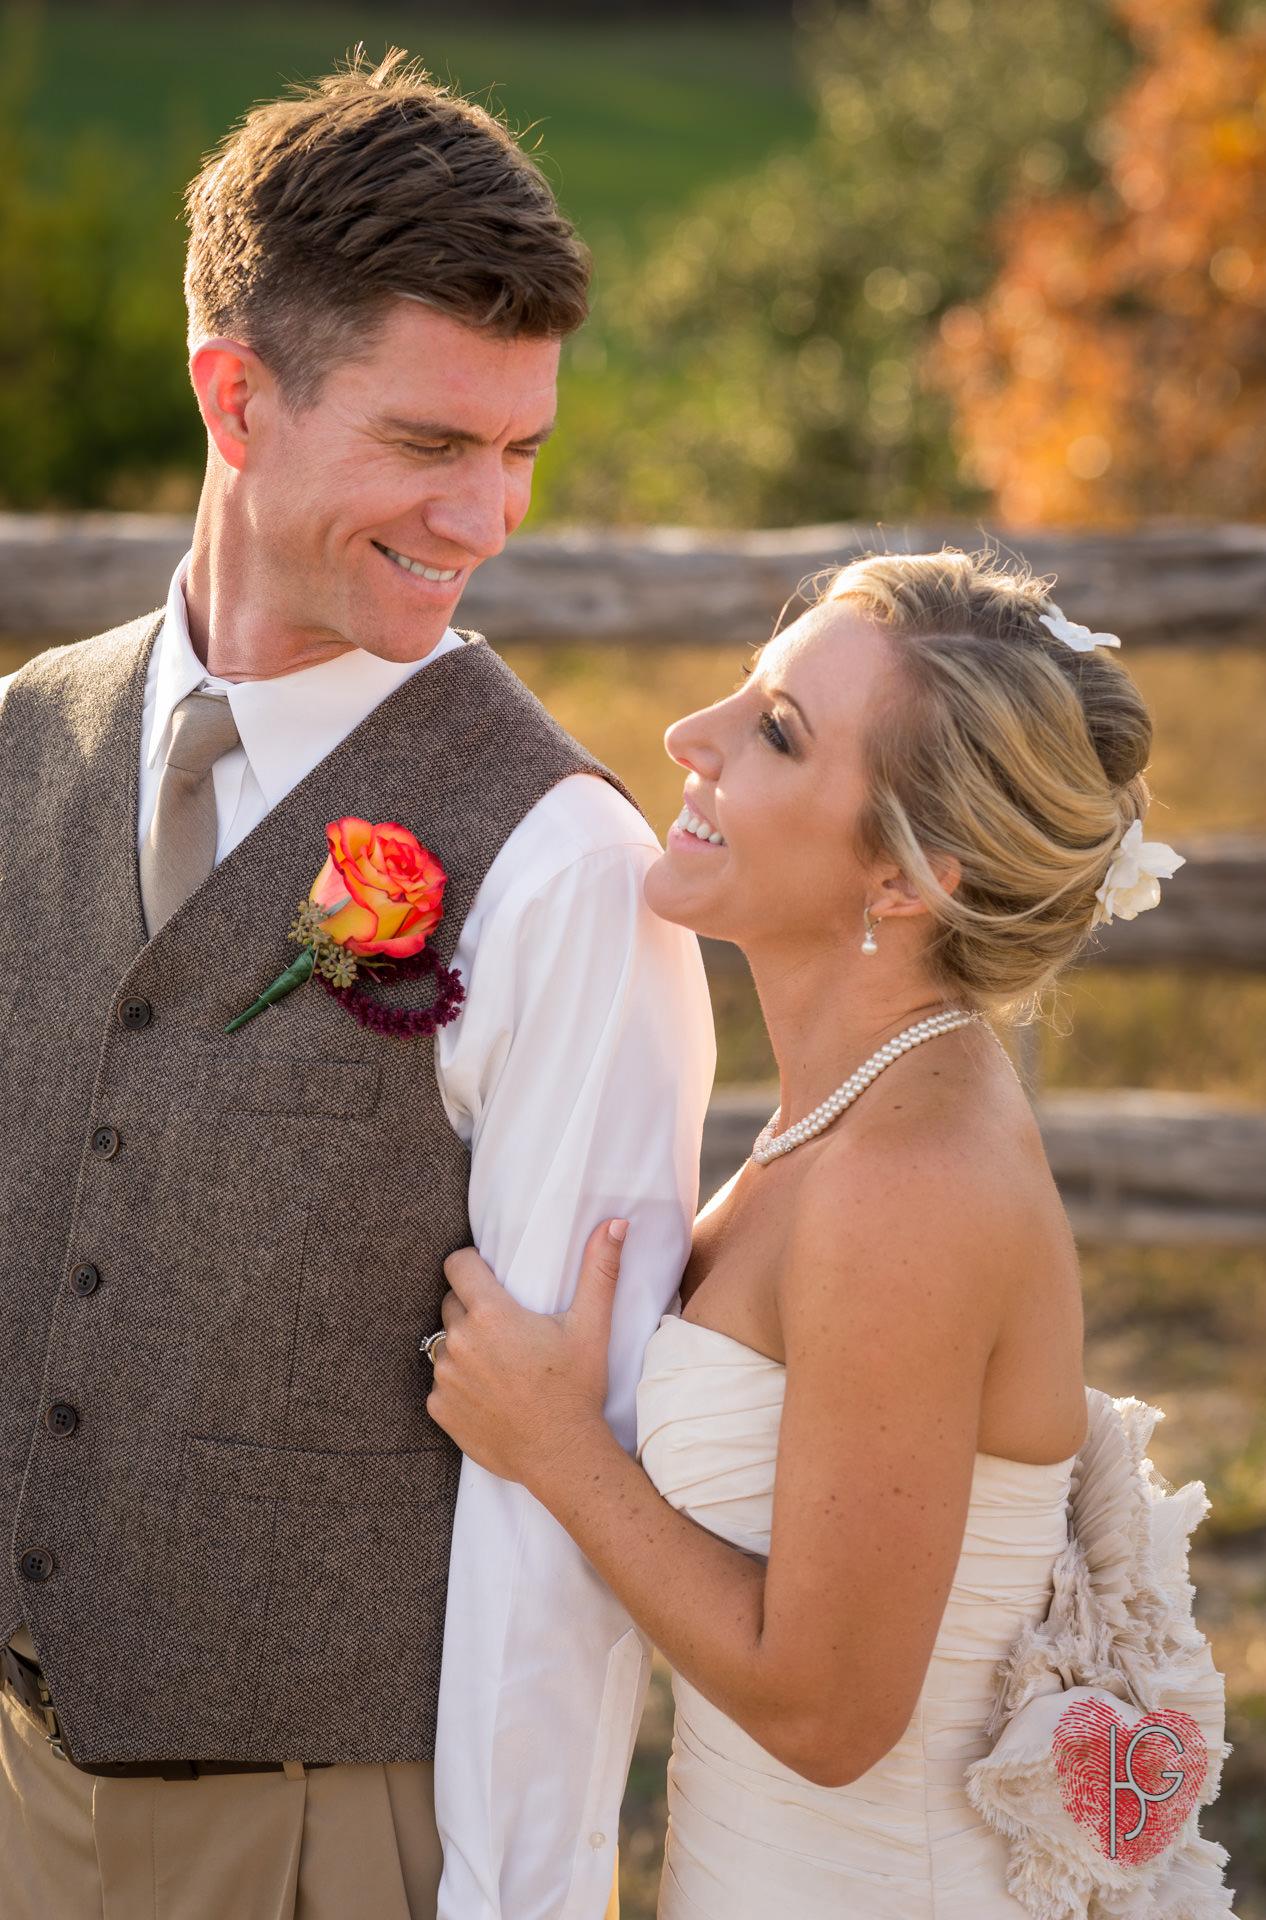 weatherford-wedding-photography-41.jpg